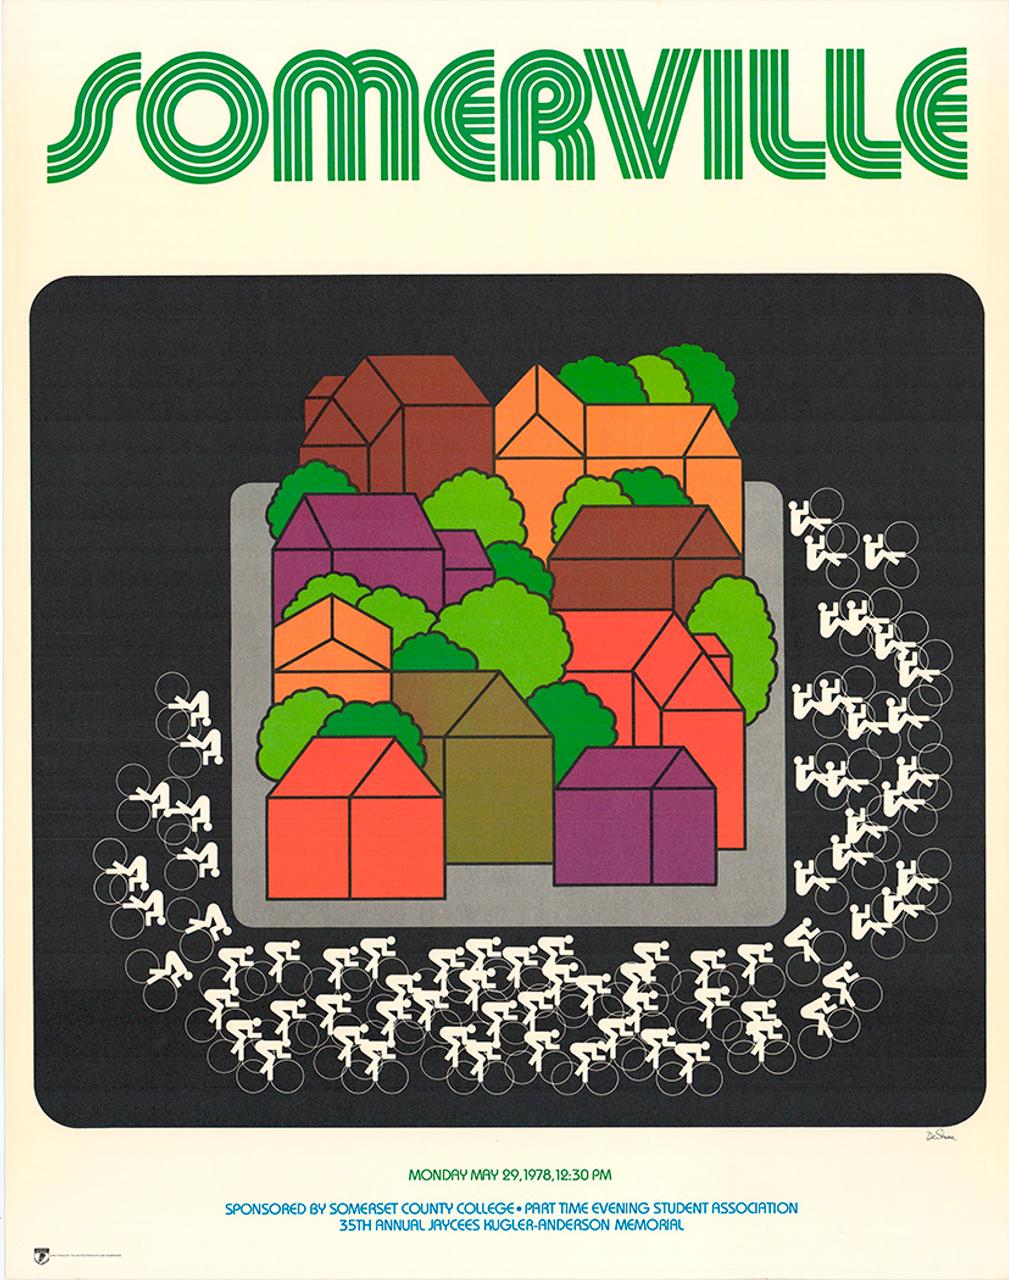 Somerville Race 1978 Original Vintage Bicycle Poster